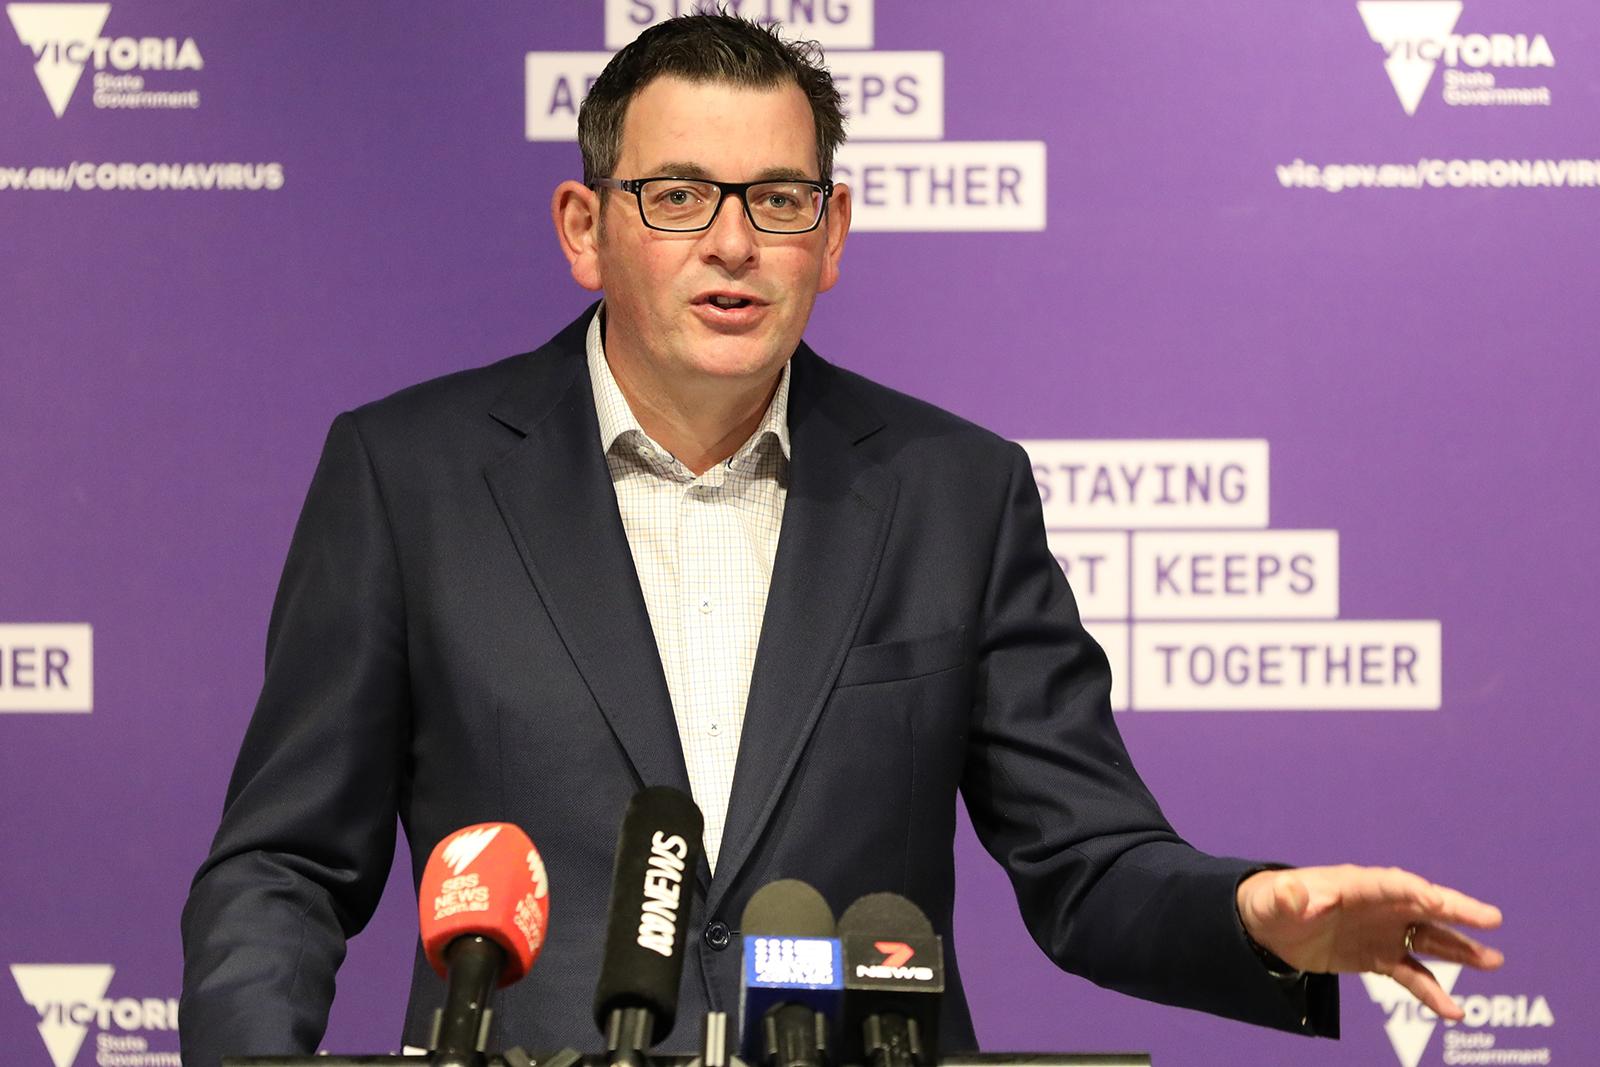 Premier of Victoria, Daniel Andrews, speaks during a press conference on June 28, in Melbourne, Australia.